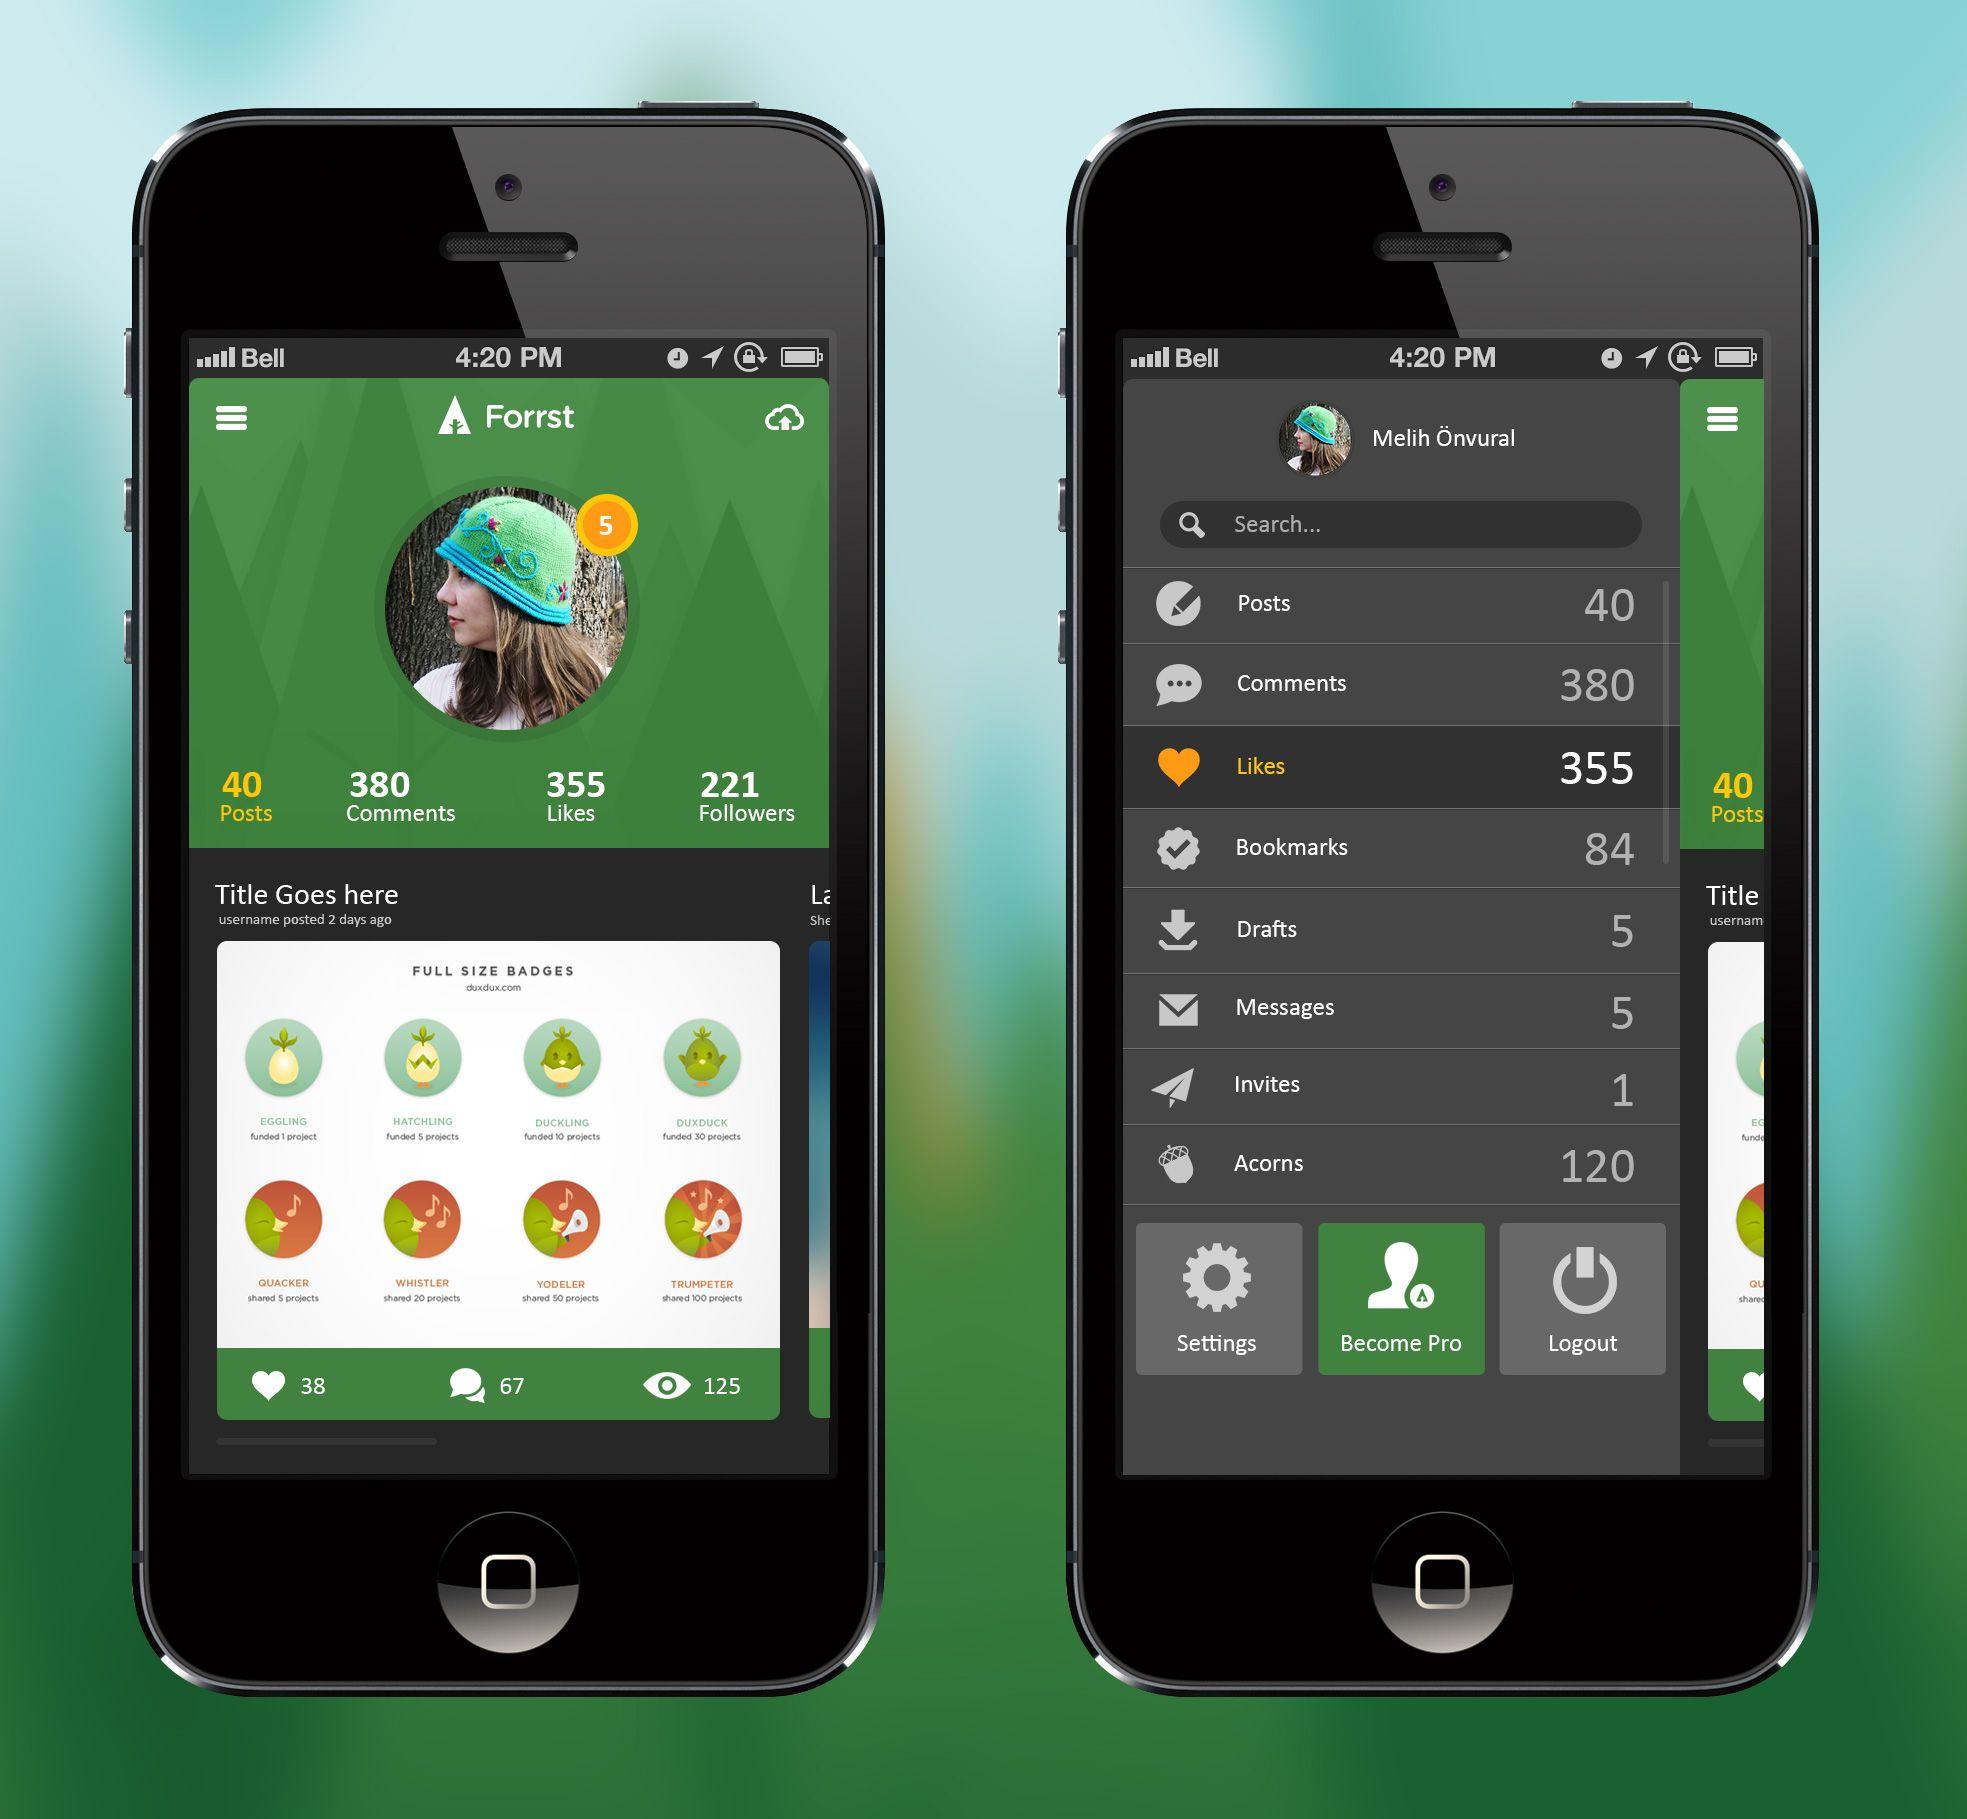 Forrst Mobile #App #UI design | UI | Pinterest | App ui design ...